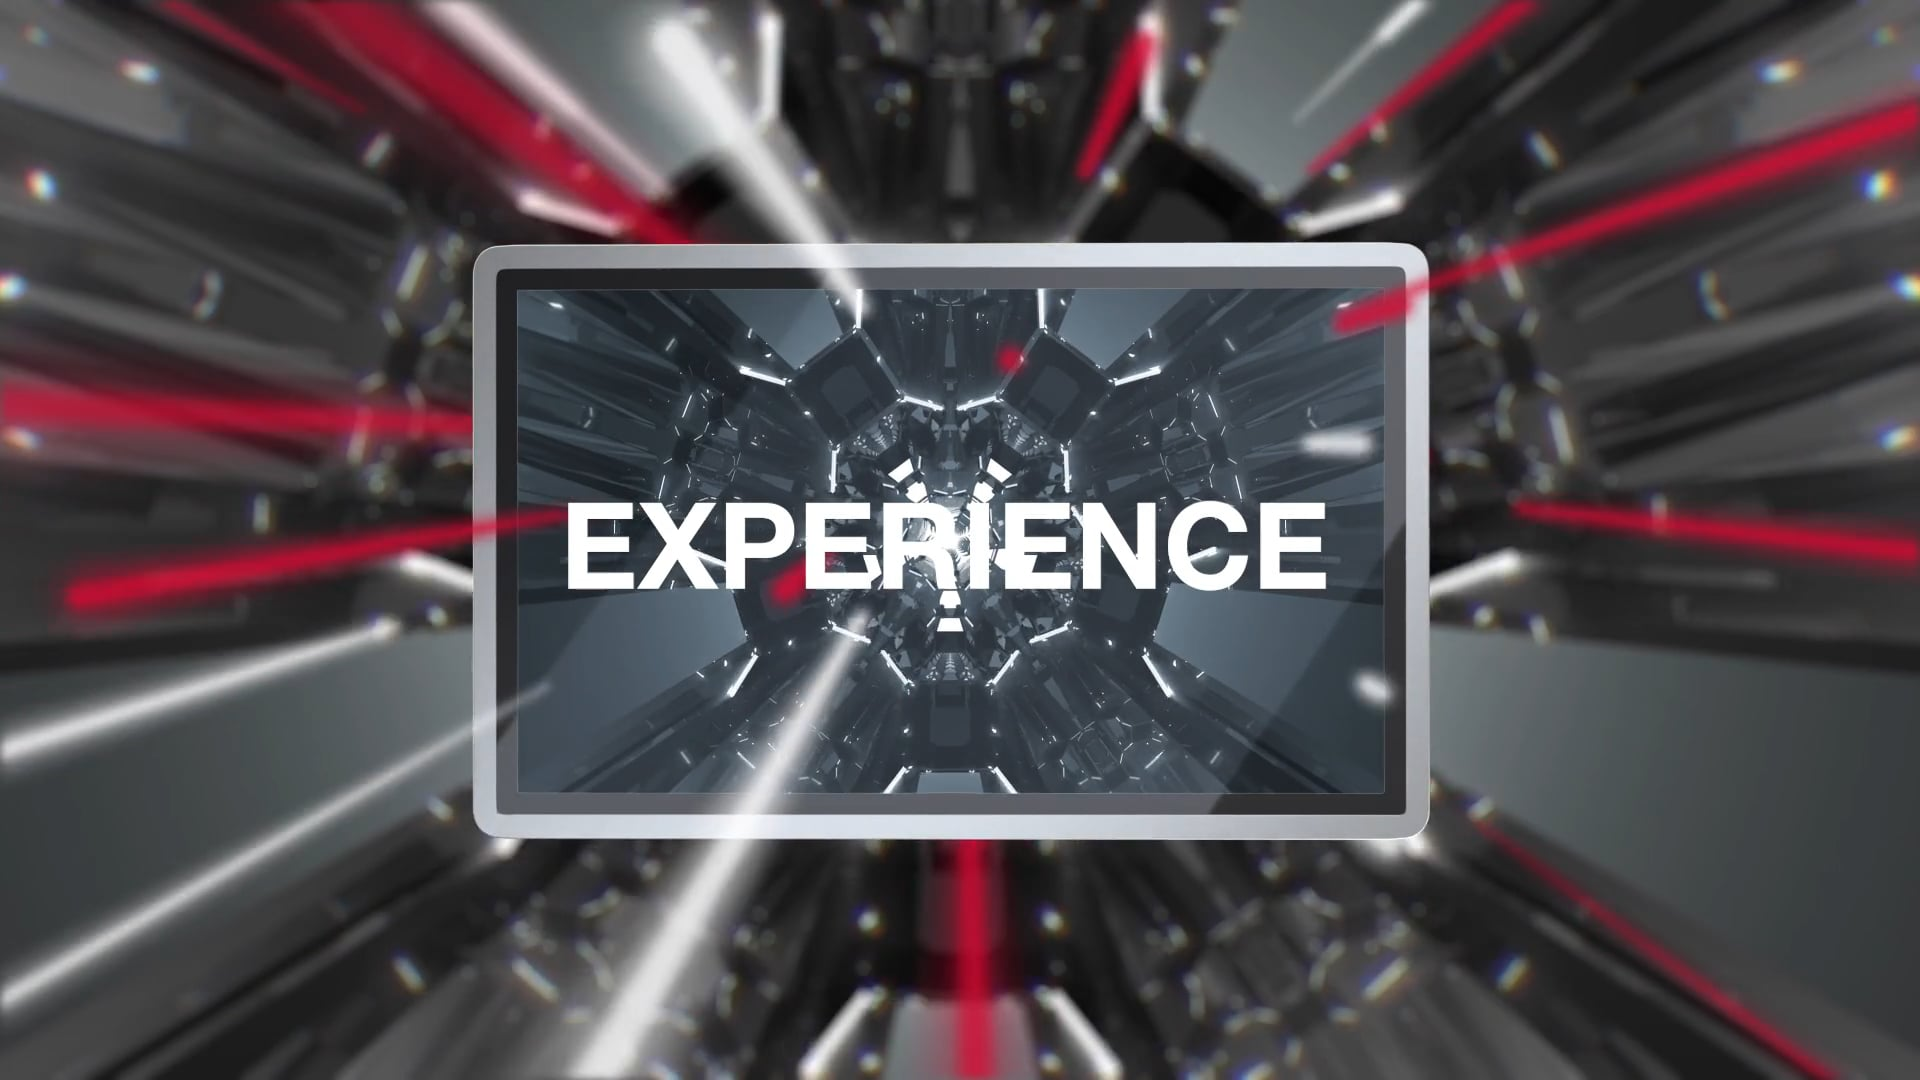 Acma, video corporate